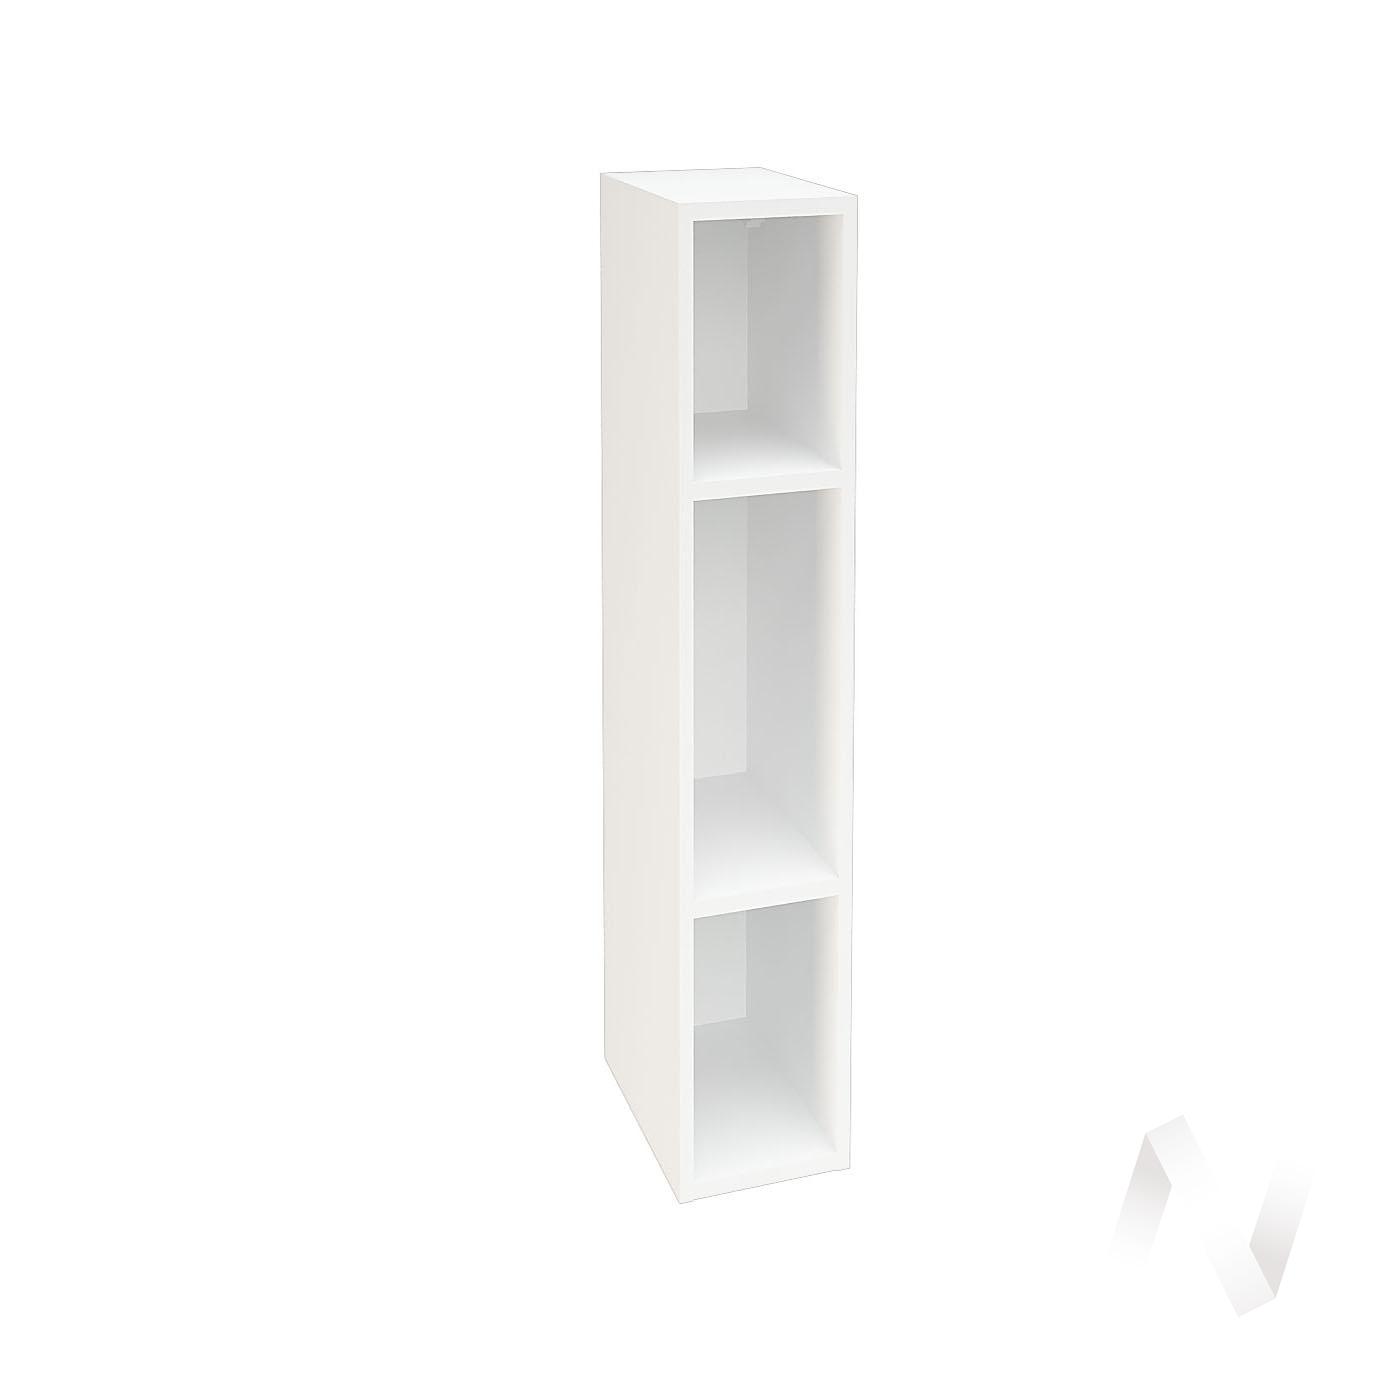 ВБ 159 Каркас верхнего шкафа (БЕЛ)